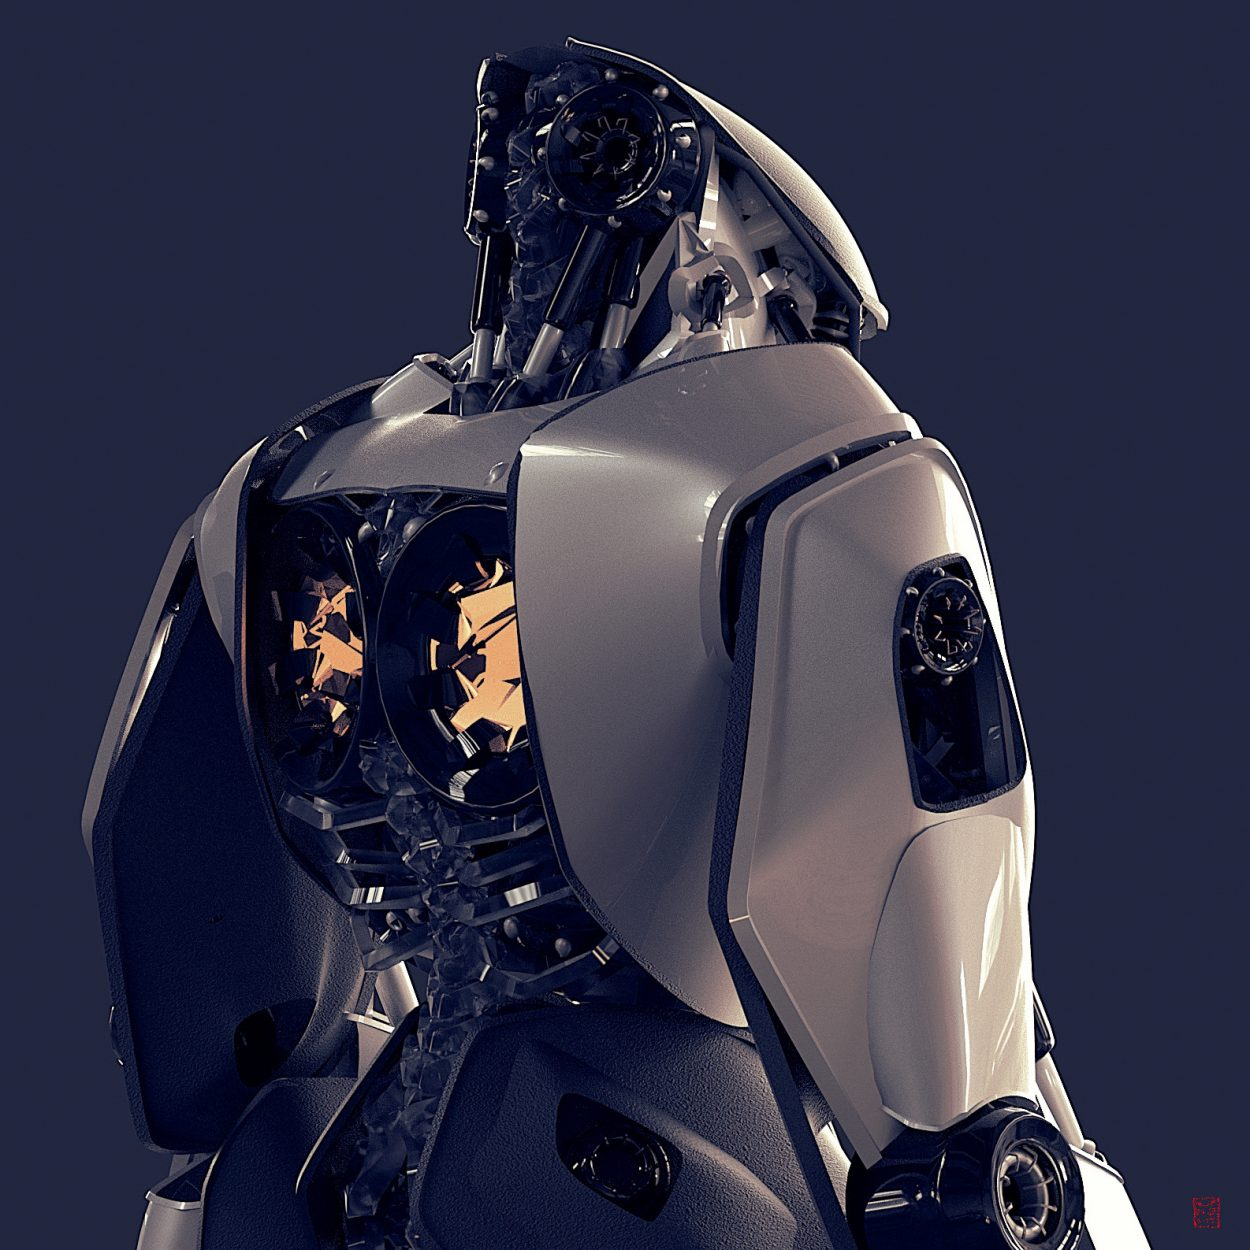 The Futuristic Digital Art of Mike Jelinek